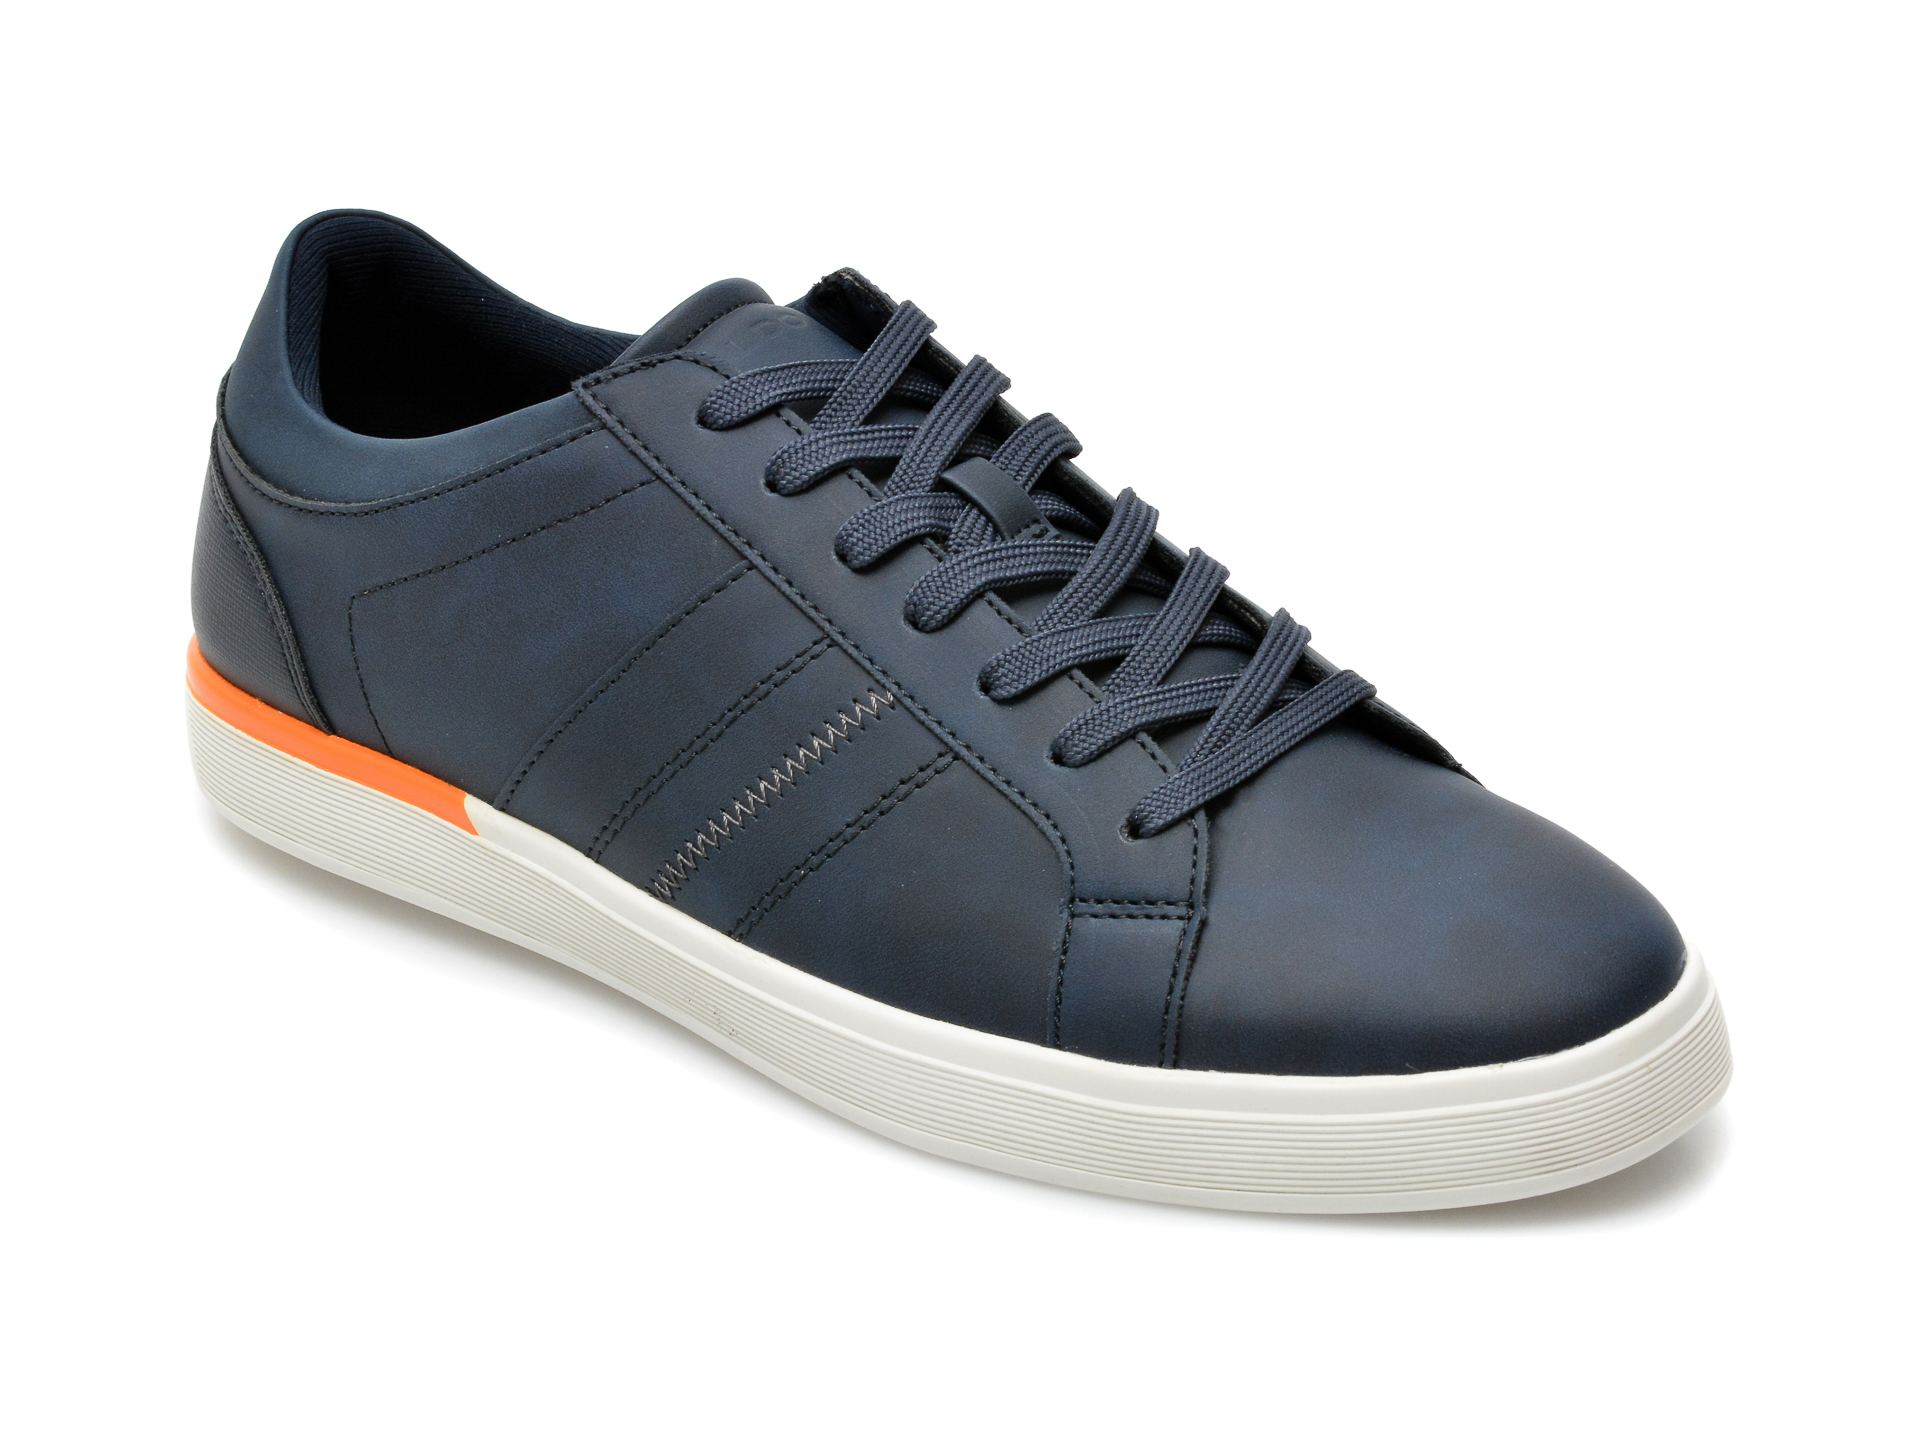 Pantofi ALDO bleumarin, Tucuman410, din piele ecologica imagine otter.ro 2021